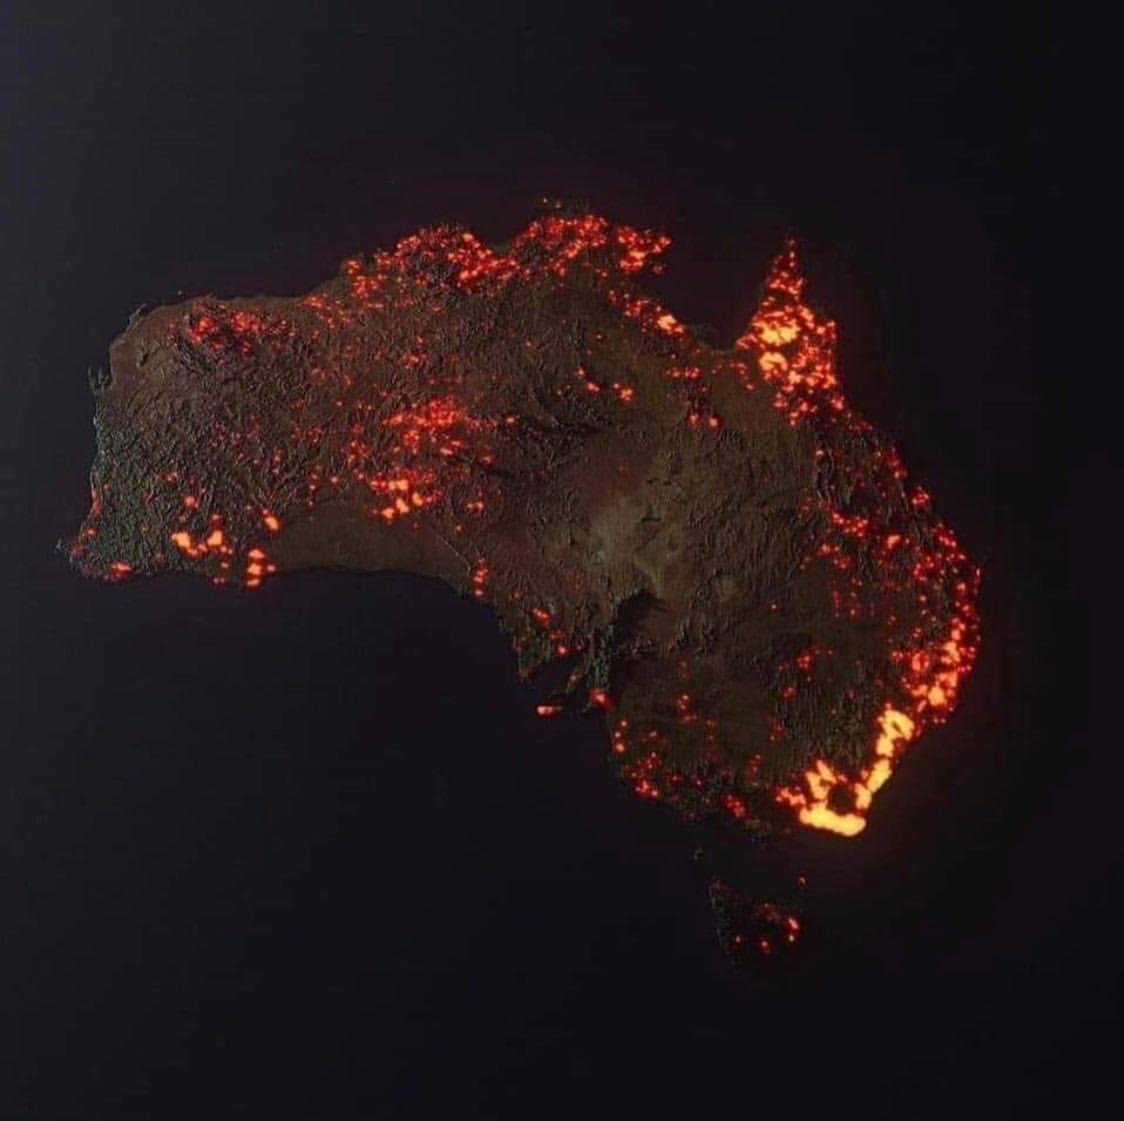 devastating.  #Australiapic.twitter.com/VB2cziPXux